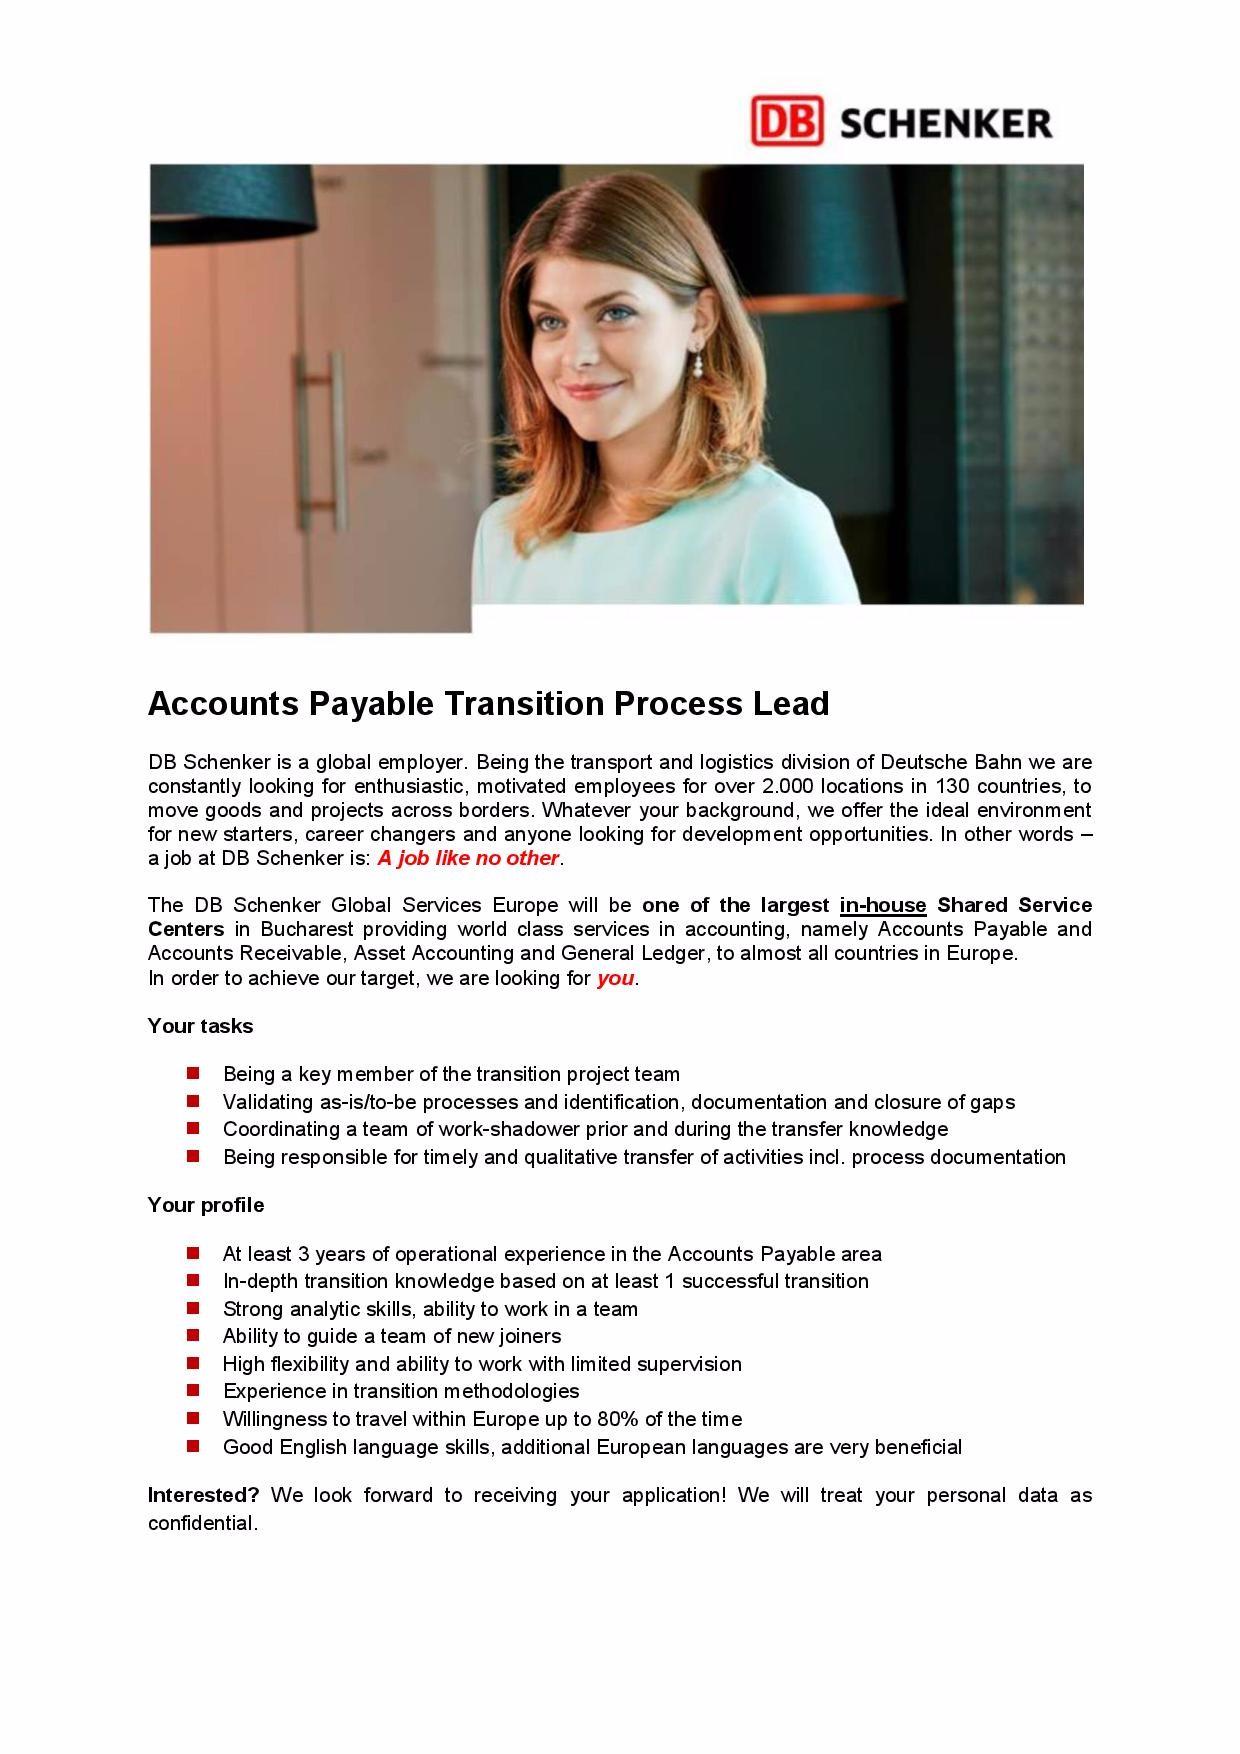 Job Add Accounts Payable Transition Process Lead-page-001